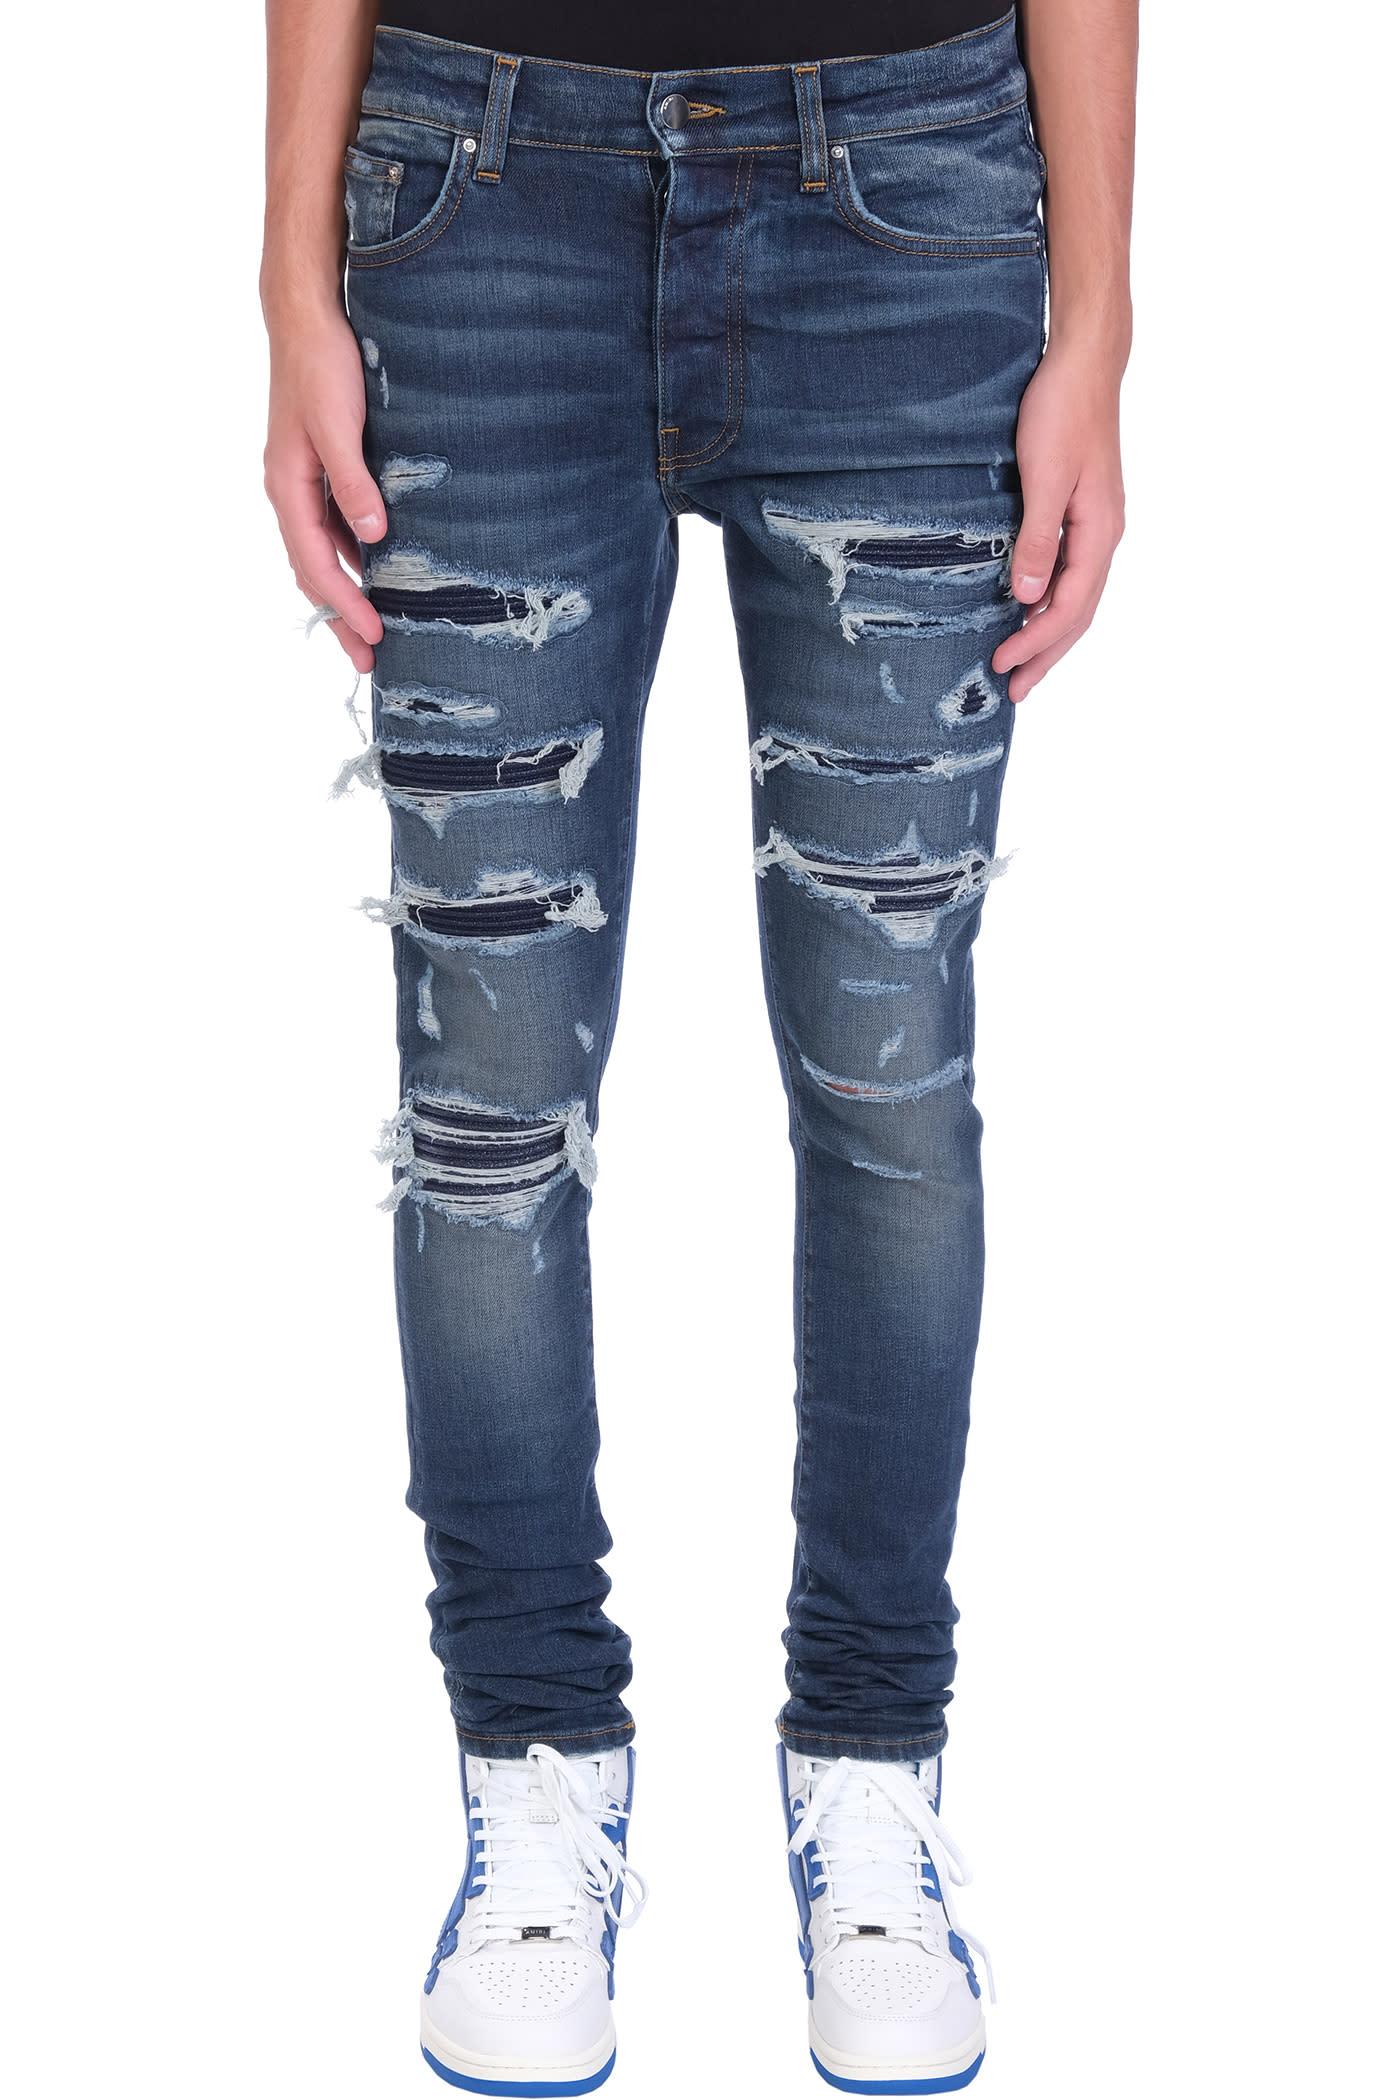 AMIRI Jeans In Blue Cotton